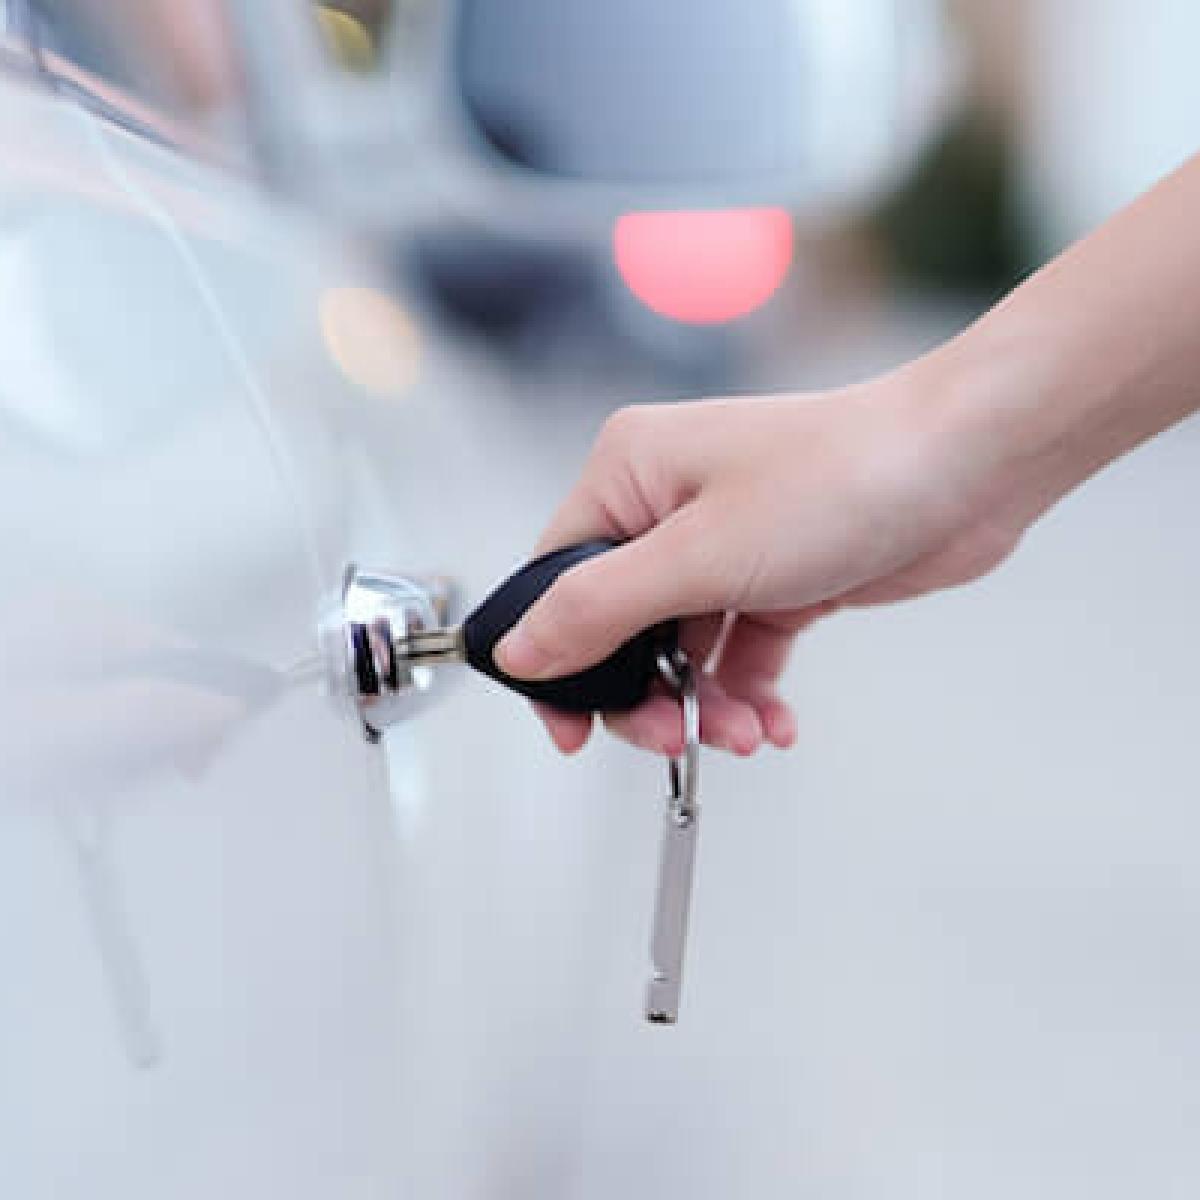 Car sales down 8% last month versus January 2019: SIAM